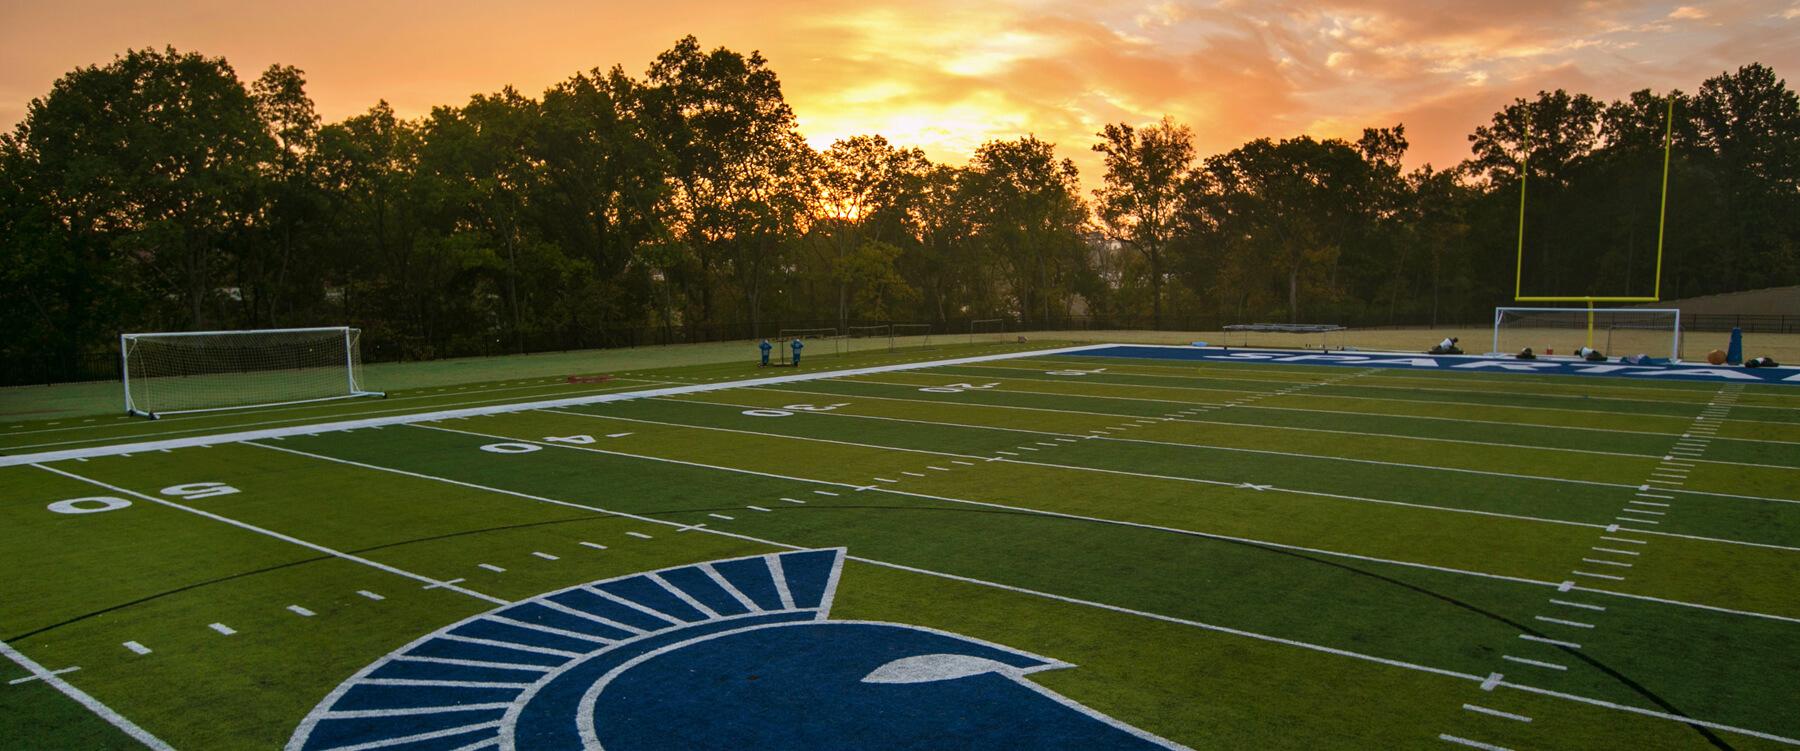 MBU athletic field